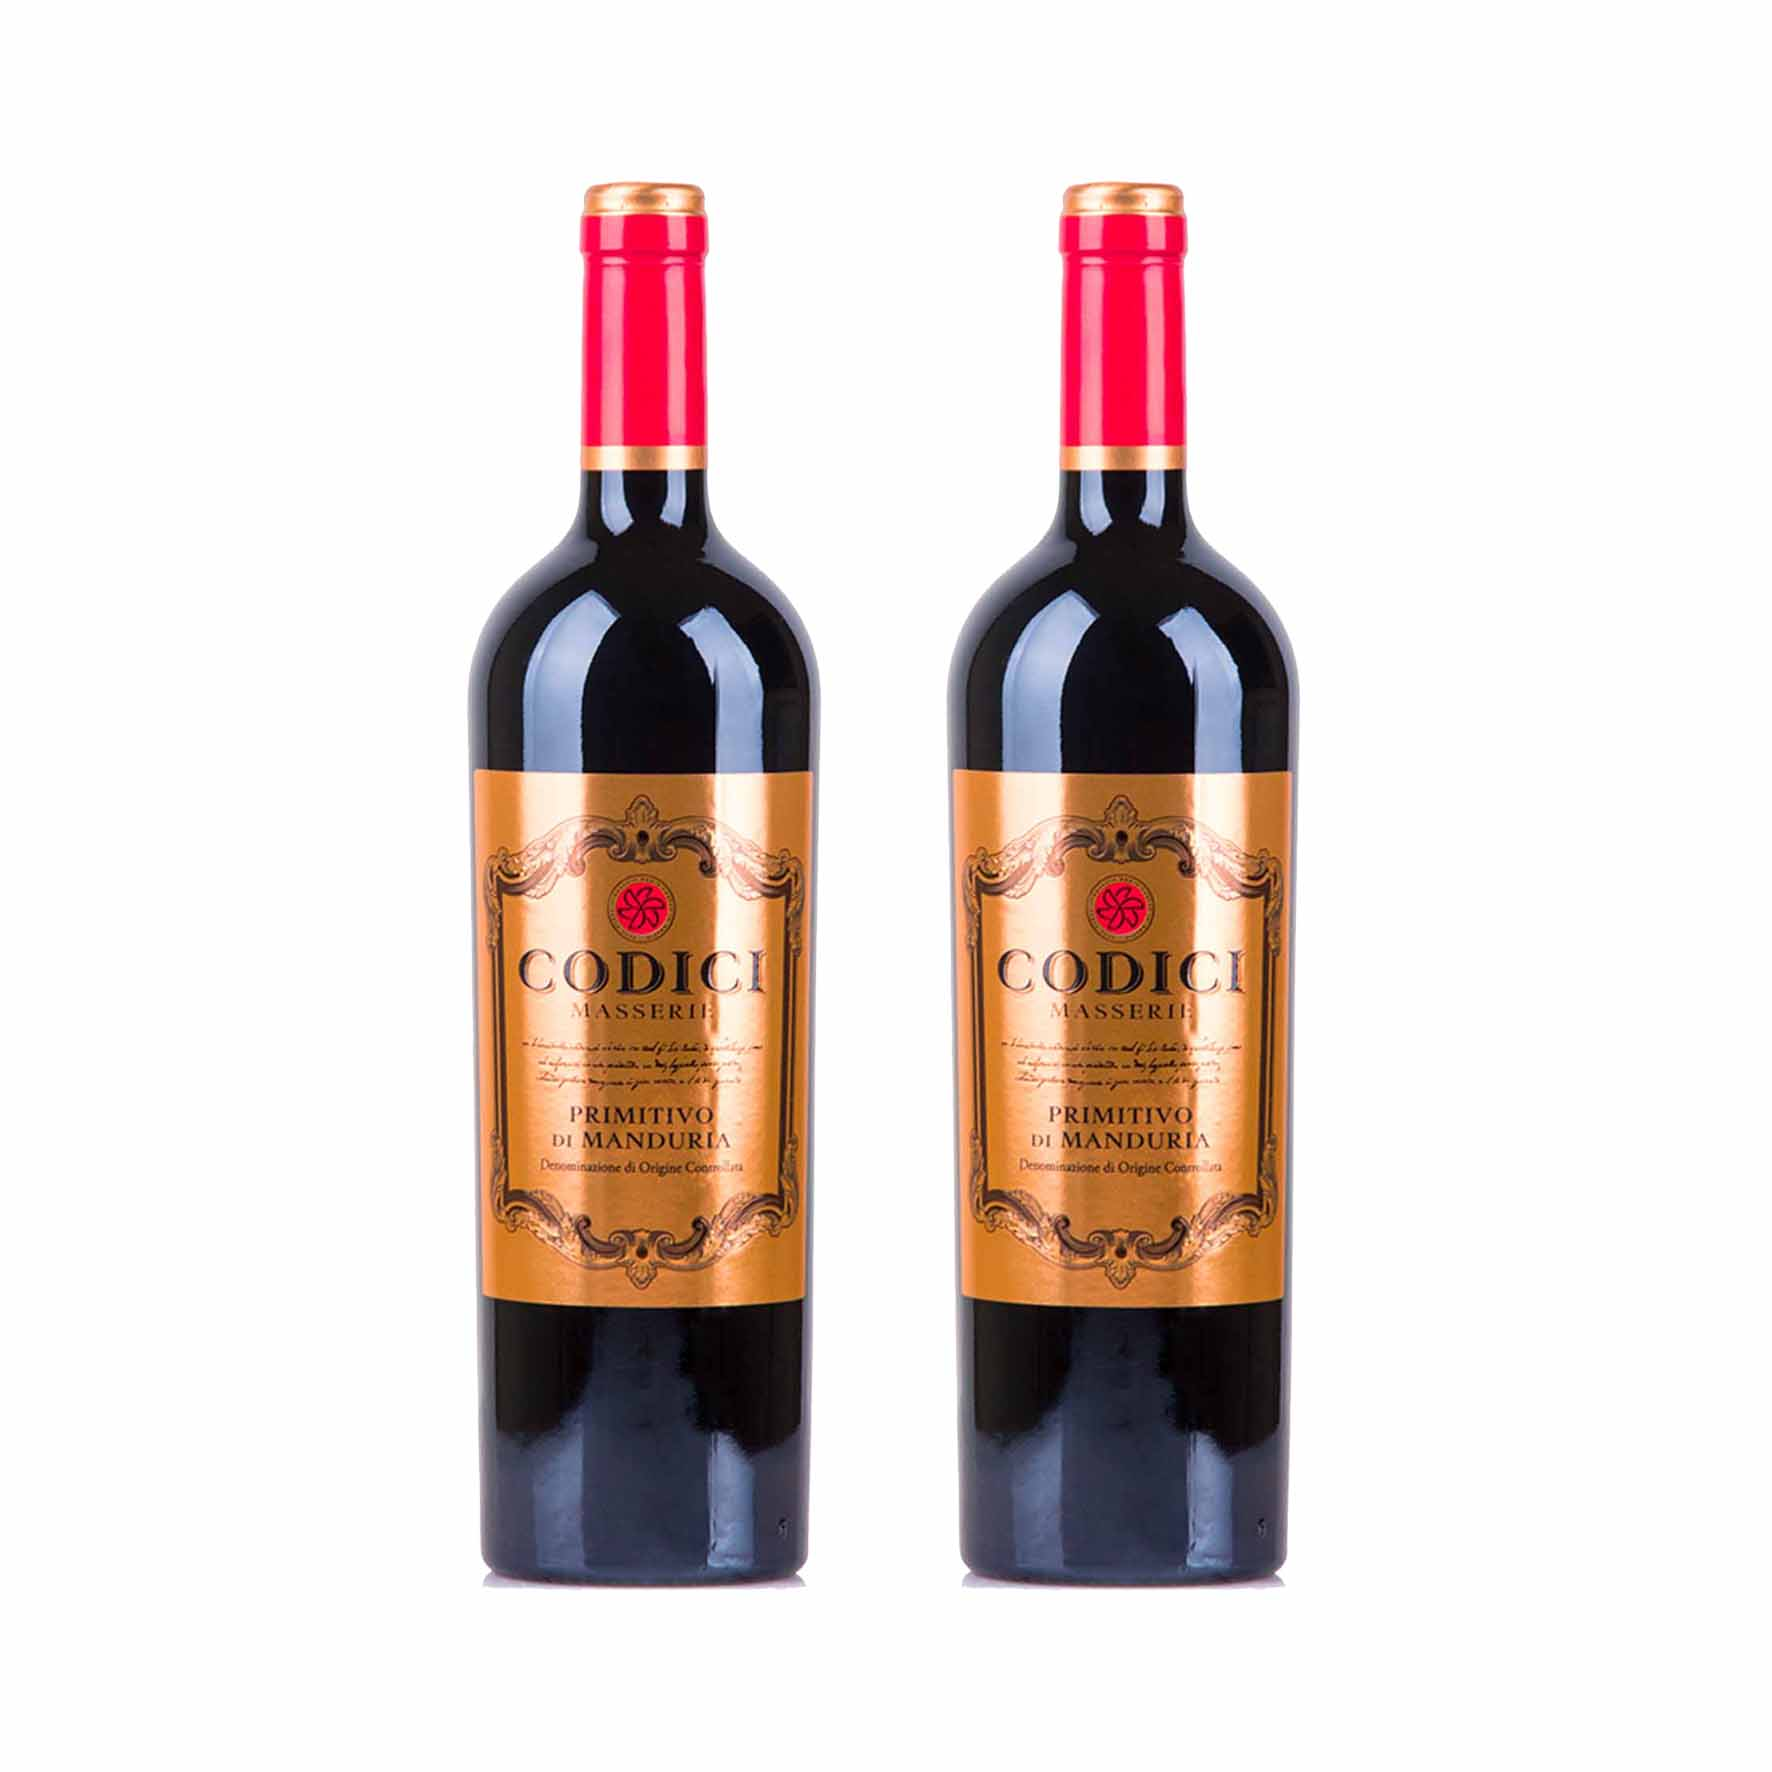 Kit 2x Vinho Italiano Tinto Primitivo di Manduria Codici 2018